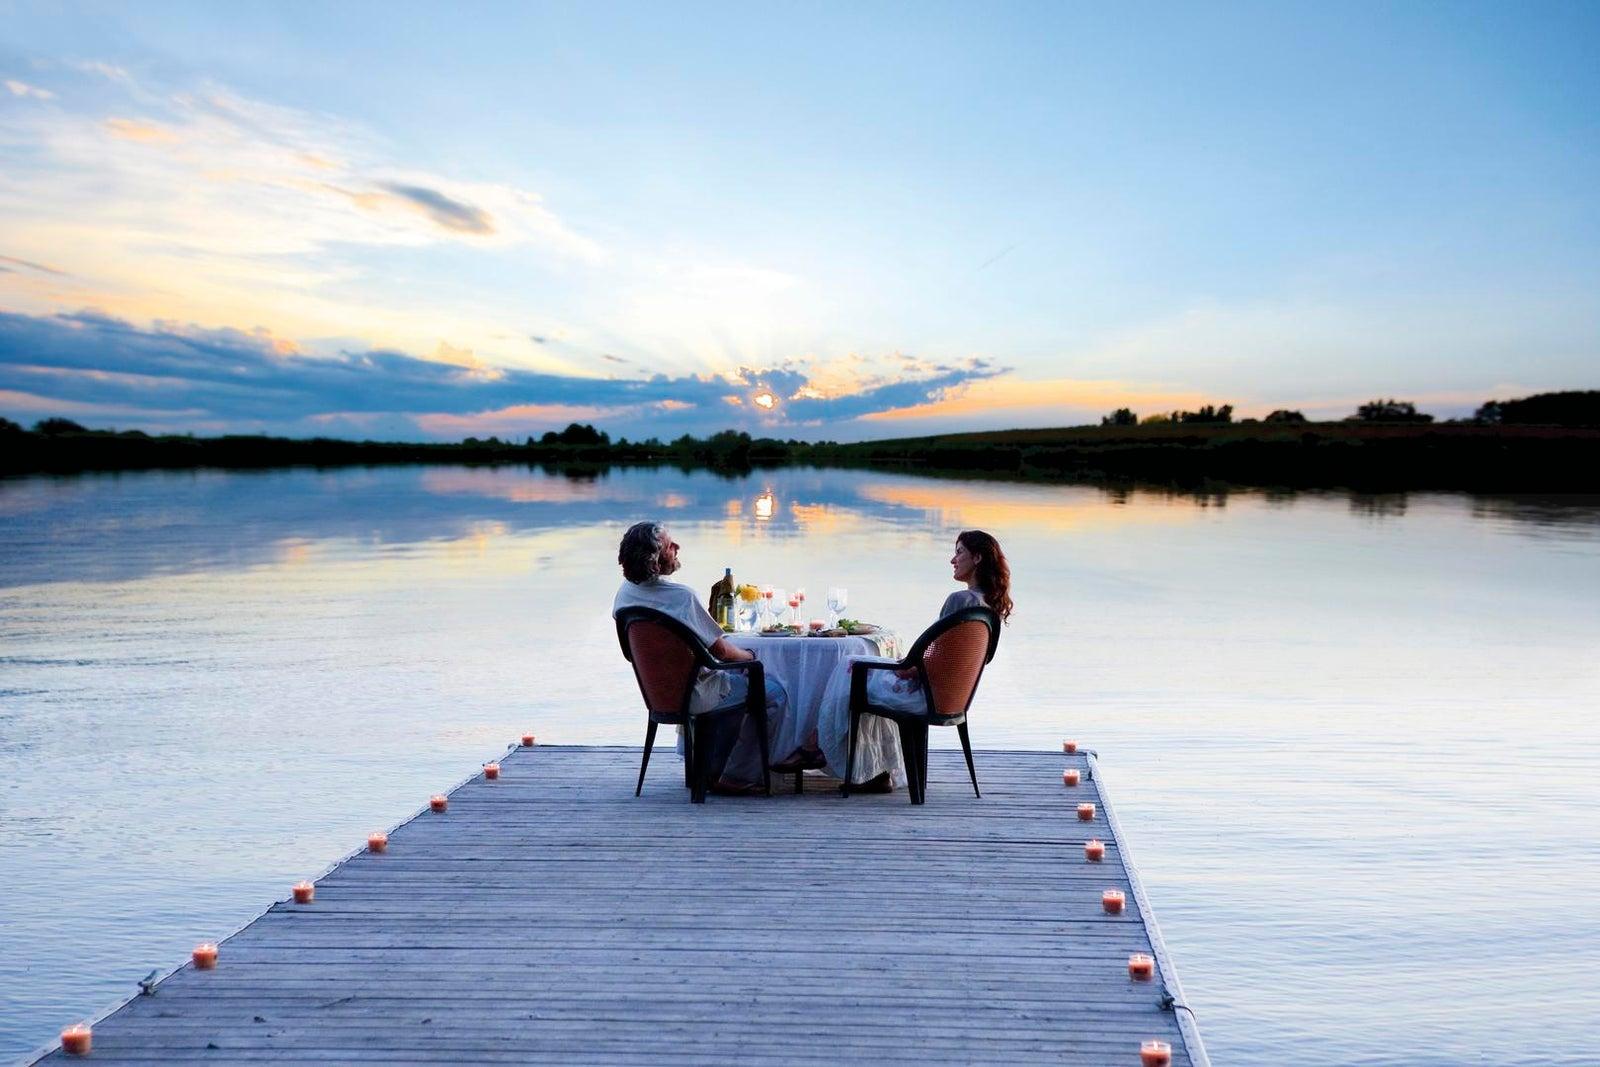 Dock Dining at WildBlue in Estero Florida